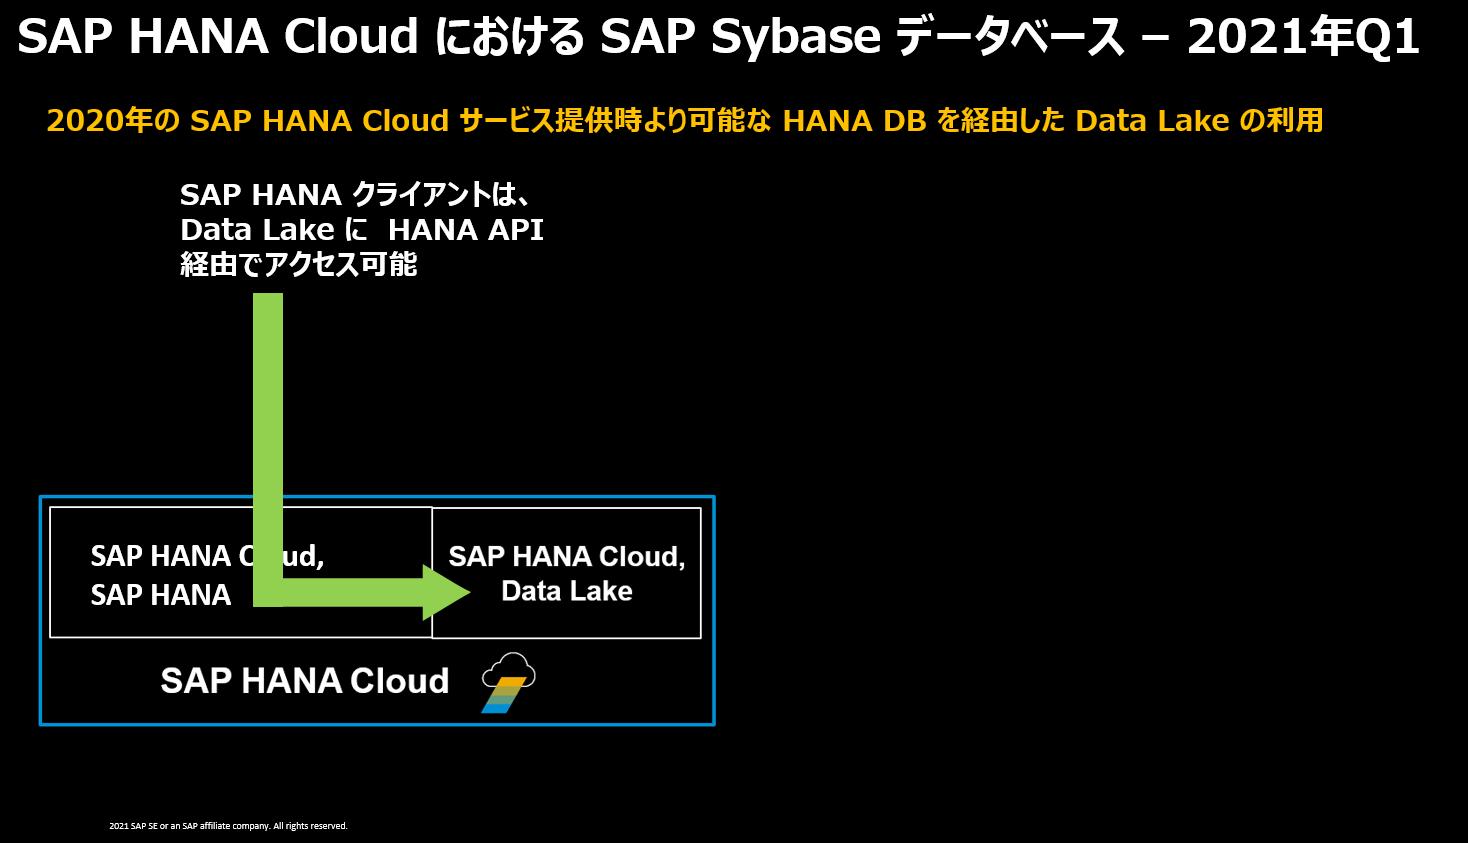 HANA Cloud Data Lake API